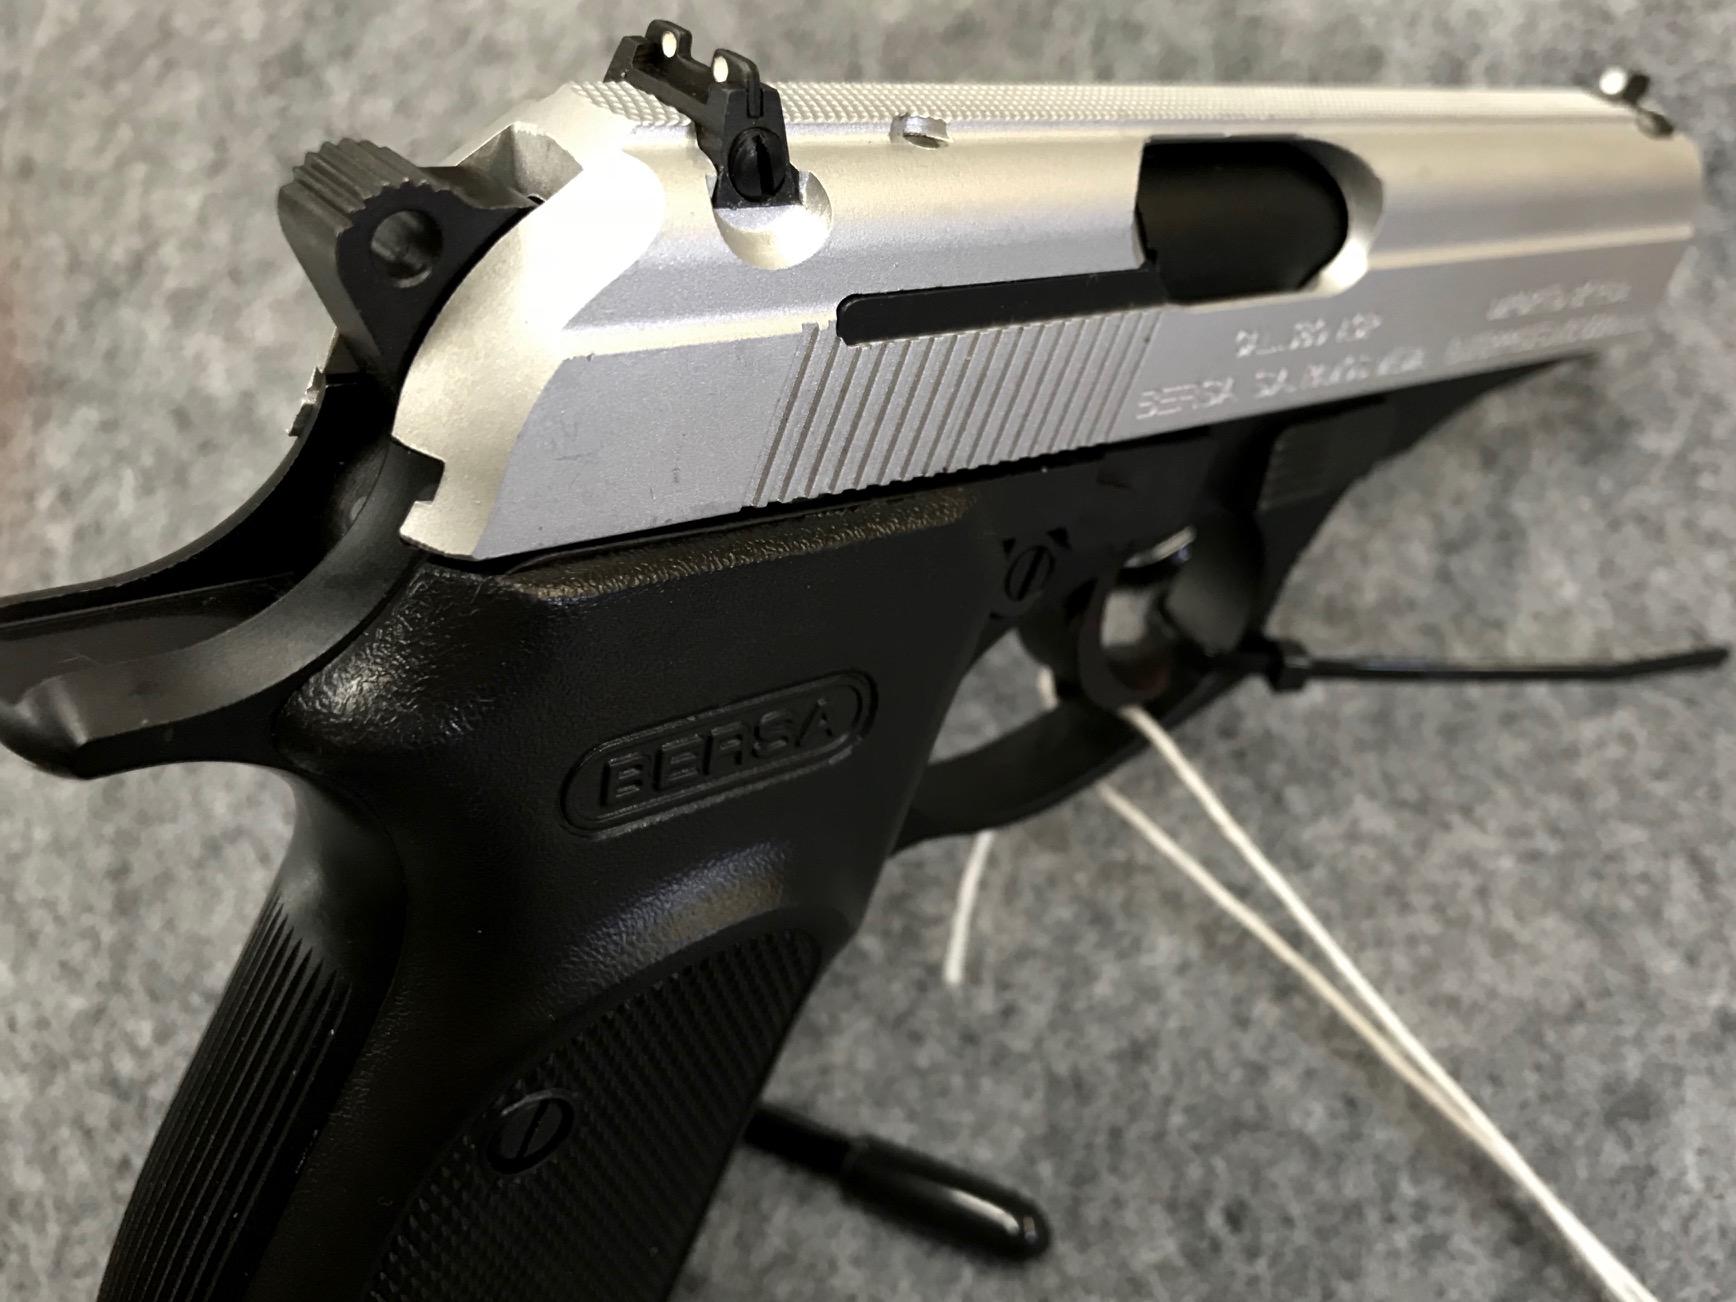 pistol-with-silver-slide.jpg